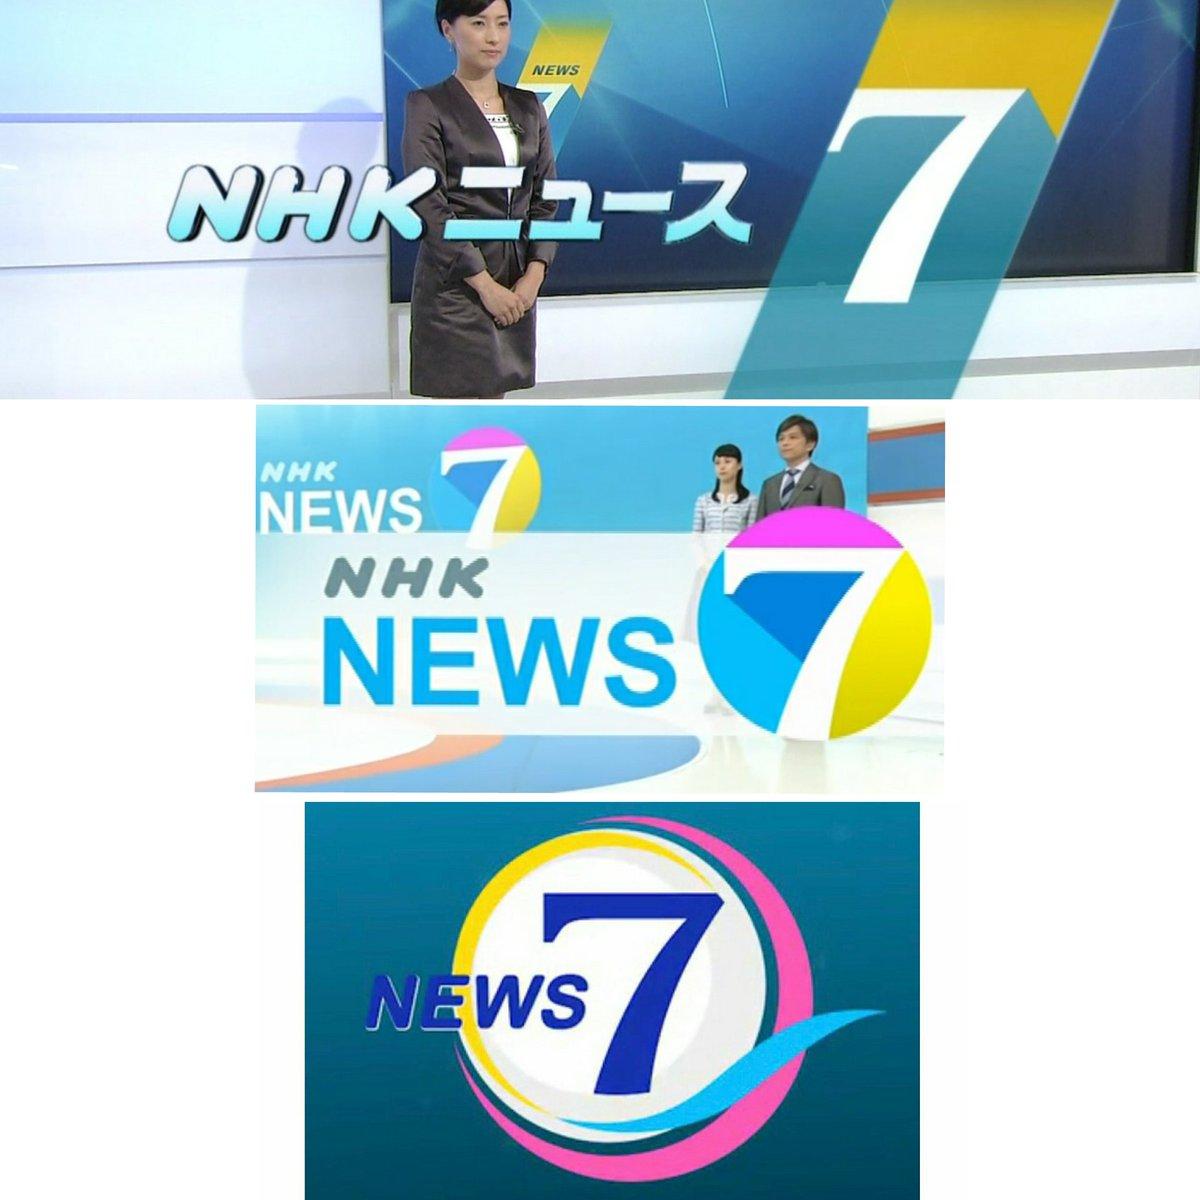 nhk ニュース 7